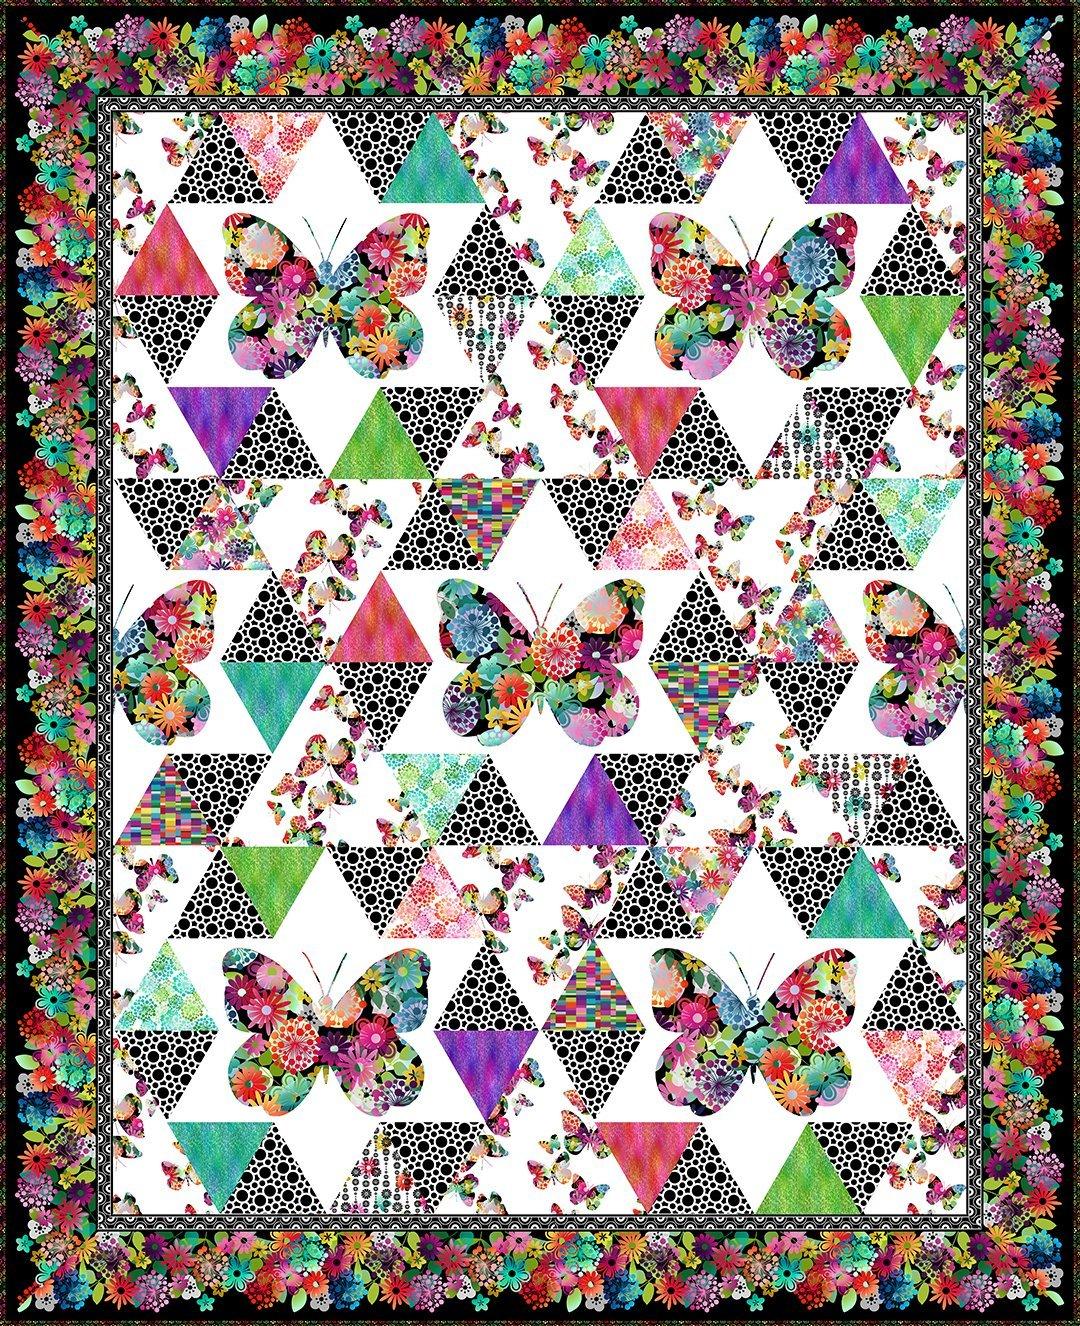 CSMD-KAGG BQM - A GROOVY GARDEN - BUTTERFLY QUILT KIT MULTI 93.5 x 115.5